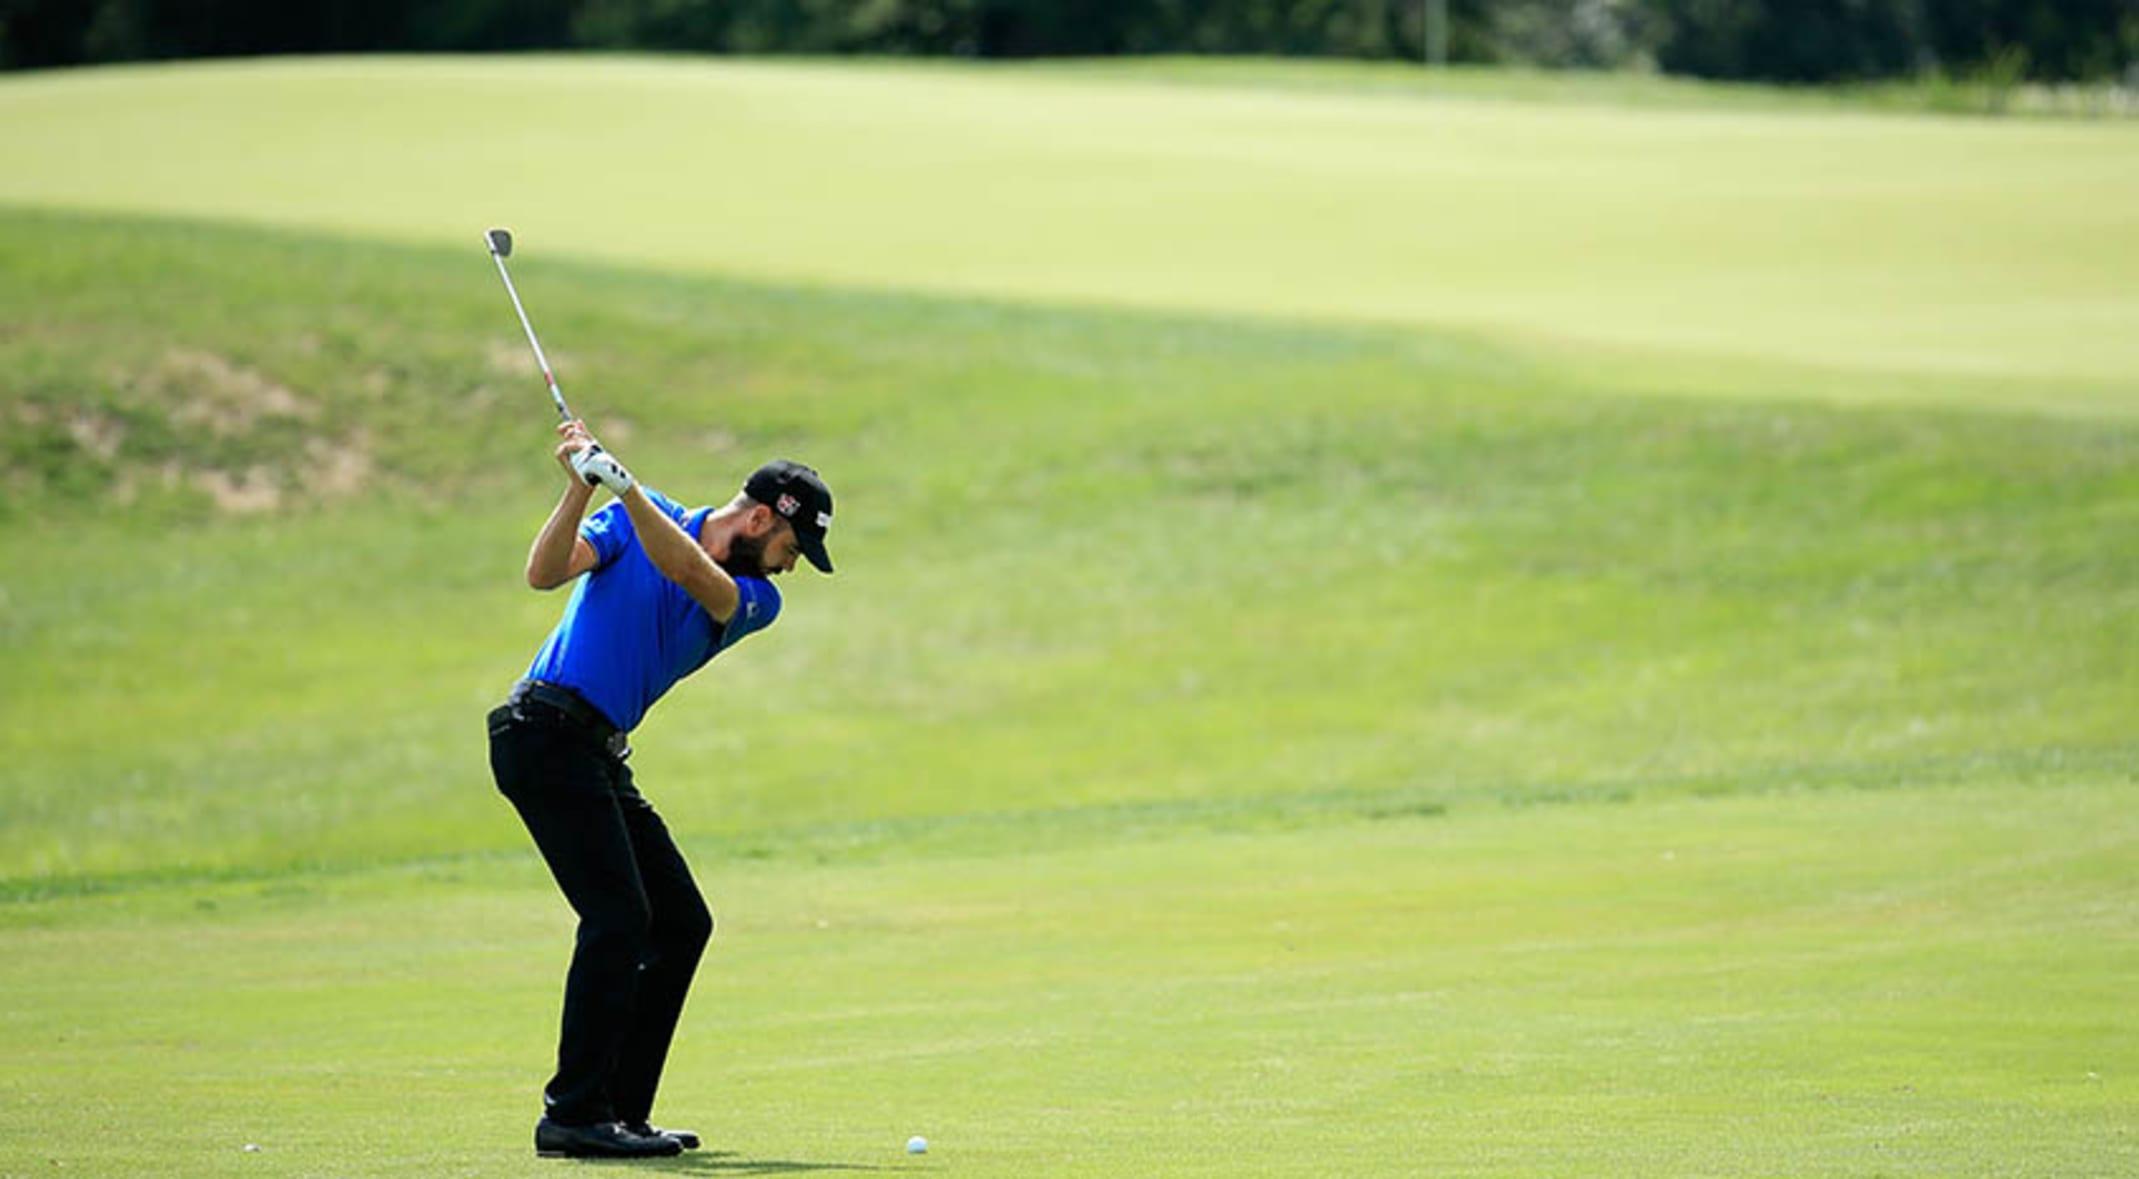 19+ Barbasol golf scores ideas